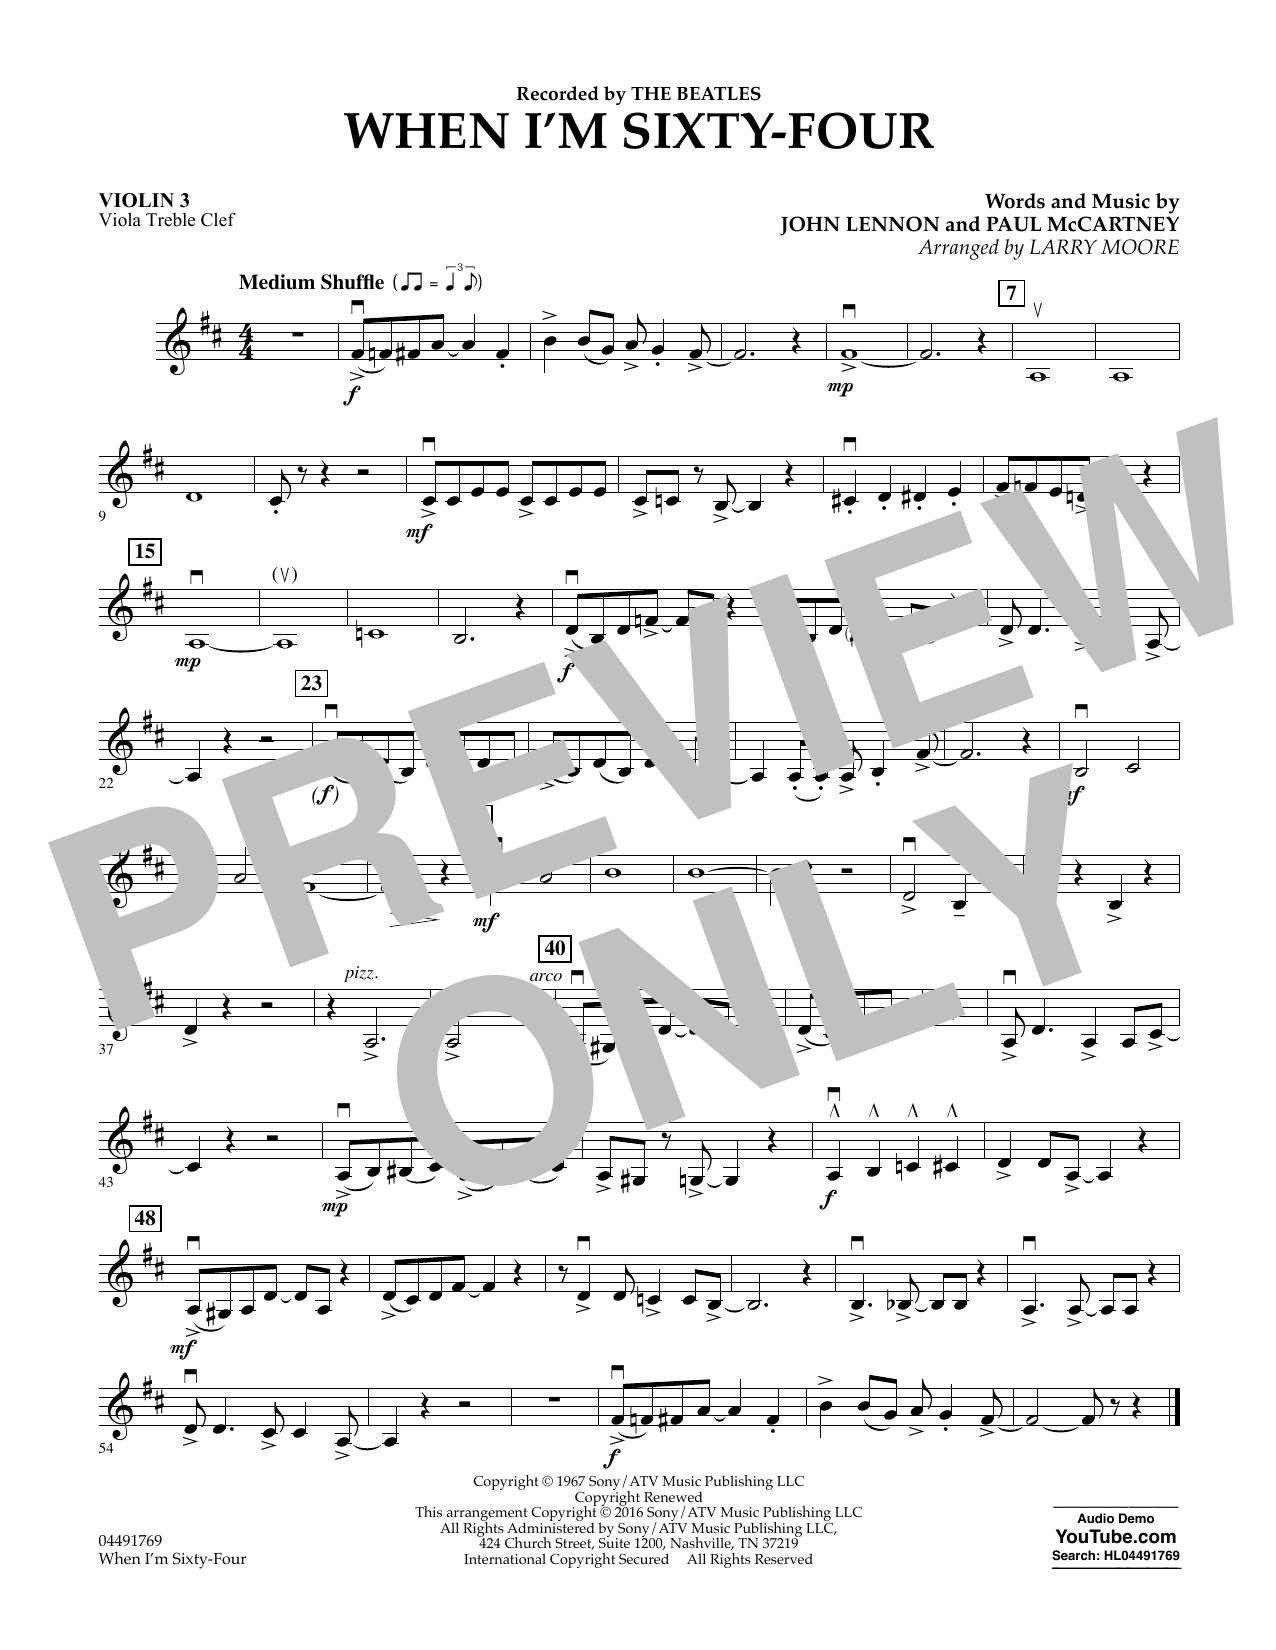 When I'm Sixty-Four - Violin 3 (Viola Treble Clef) (Orchestra)